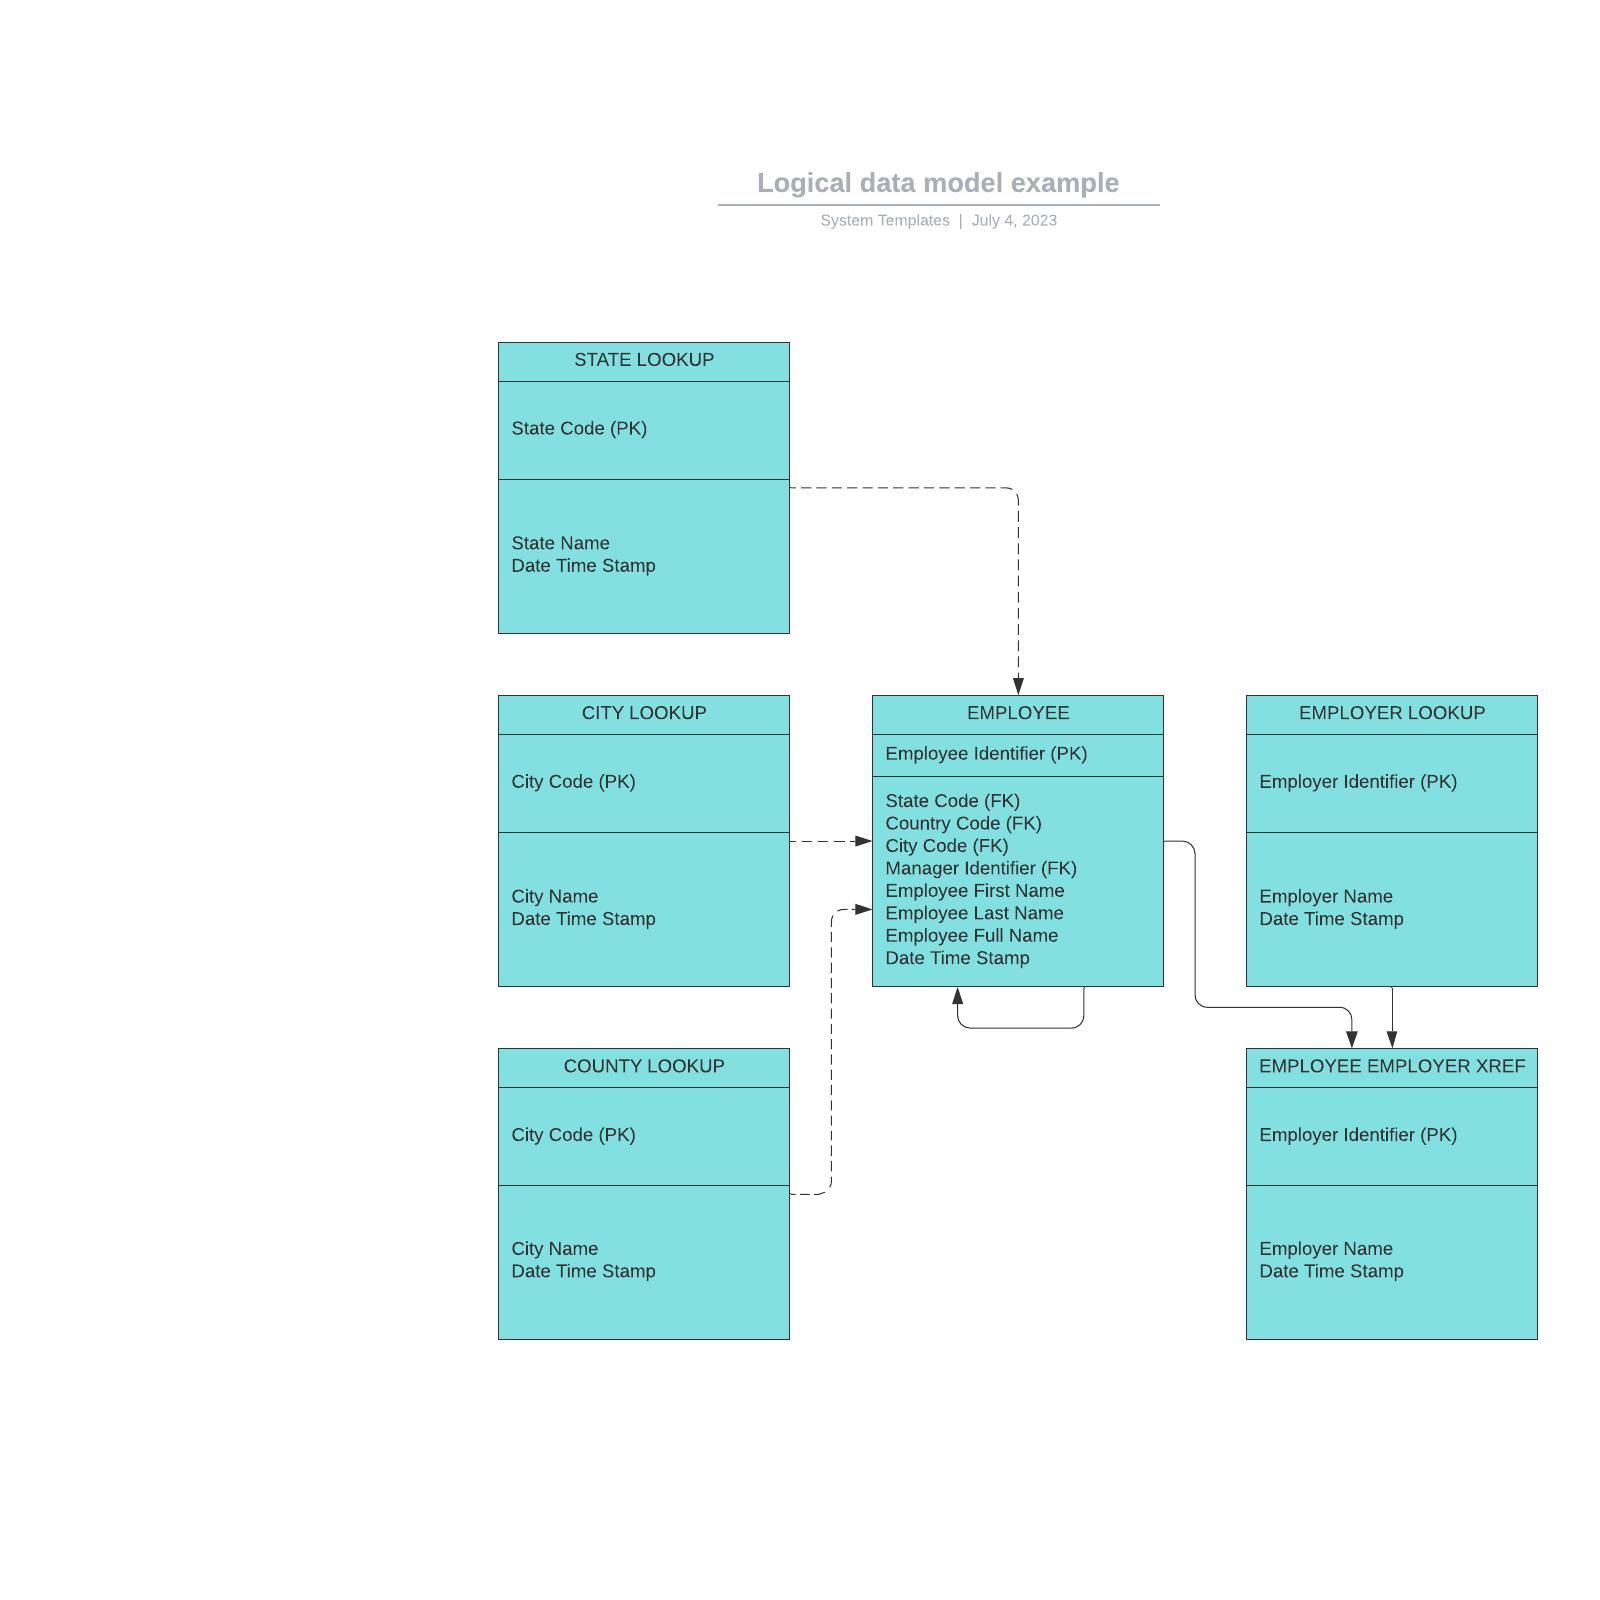 Logical data model example